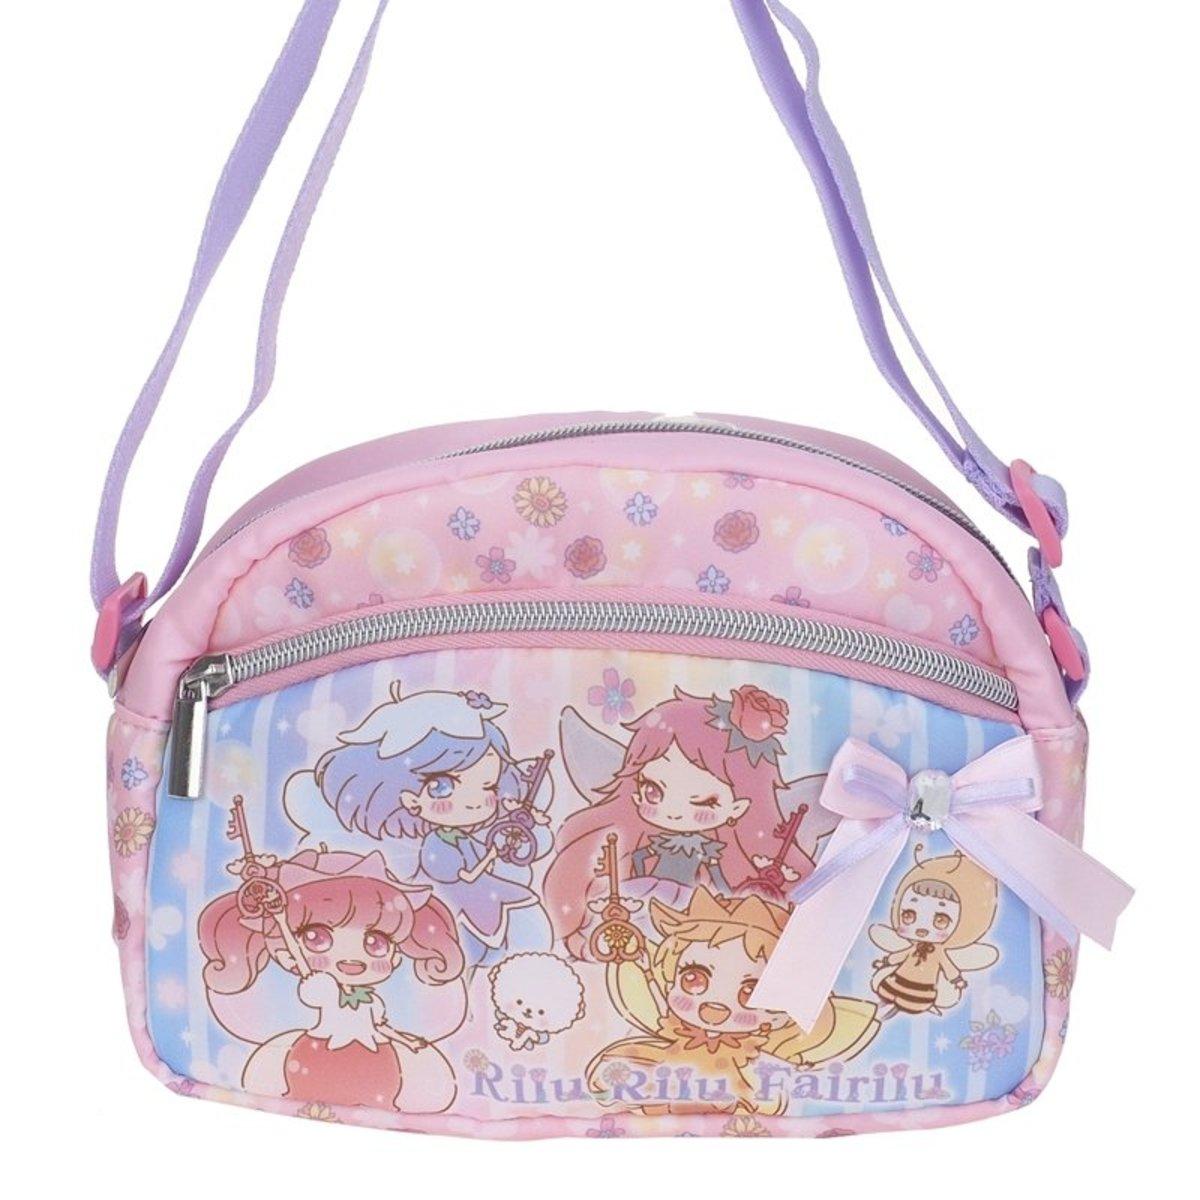 SANRIO- (Rilu Rilu Fairilu Kids Crossbody Bag)